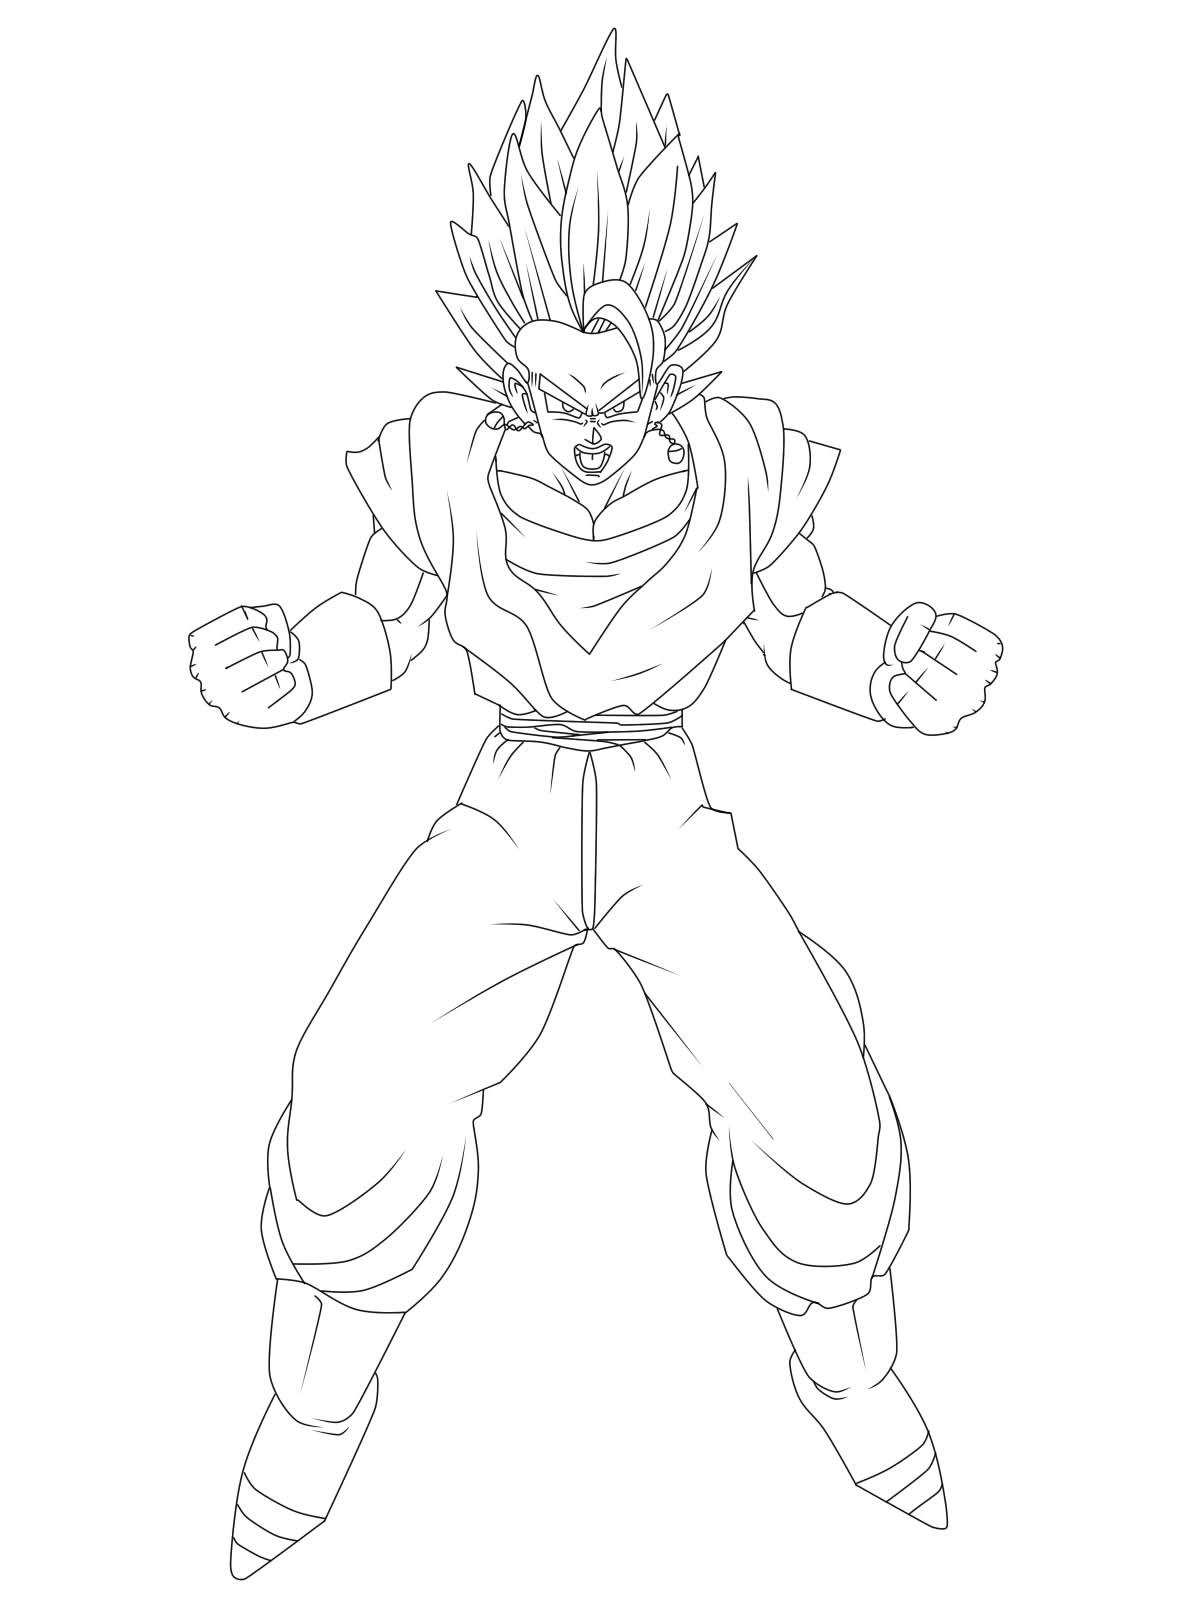 Dibujos De Dragon Ball Z Para Colorear Vegito picture gallery